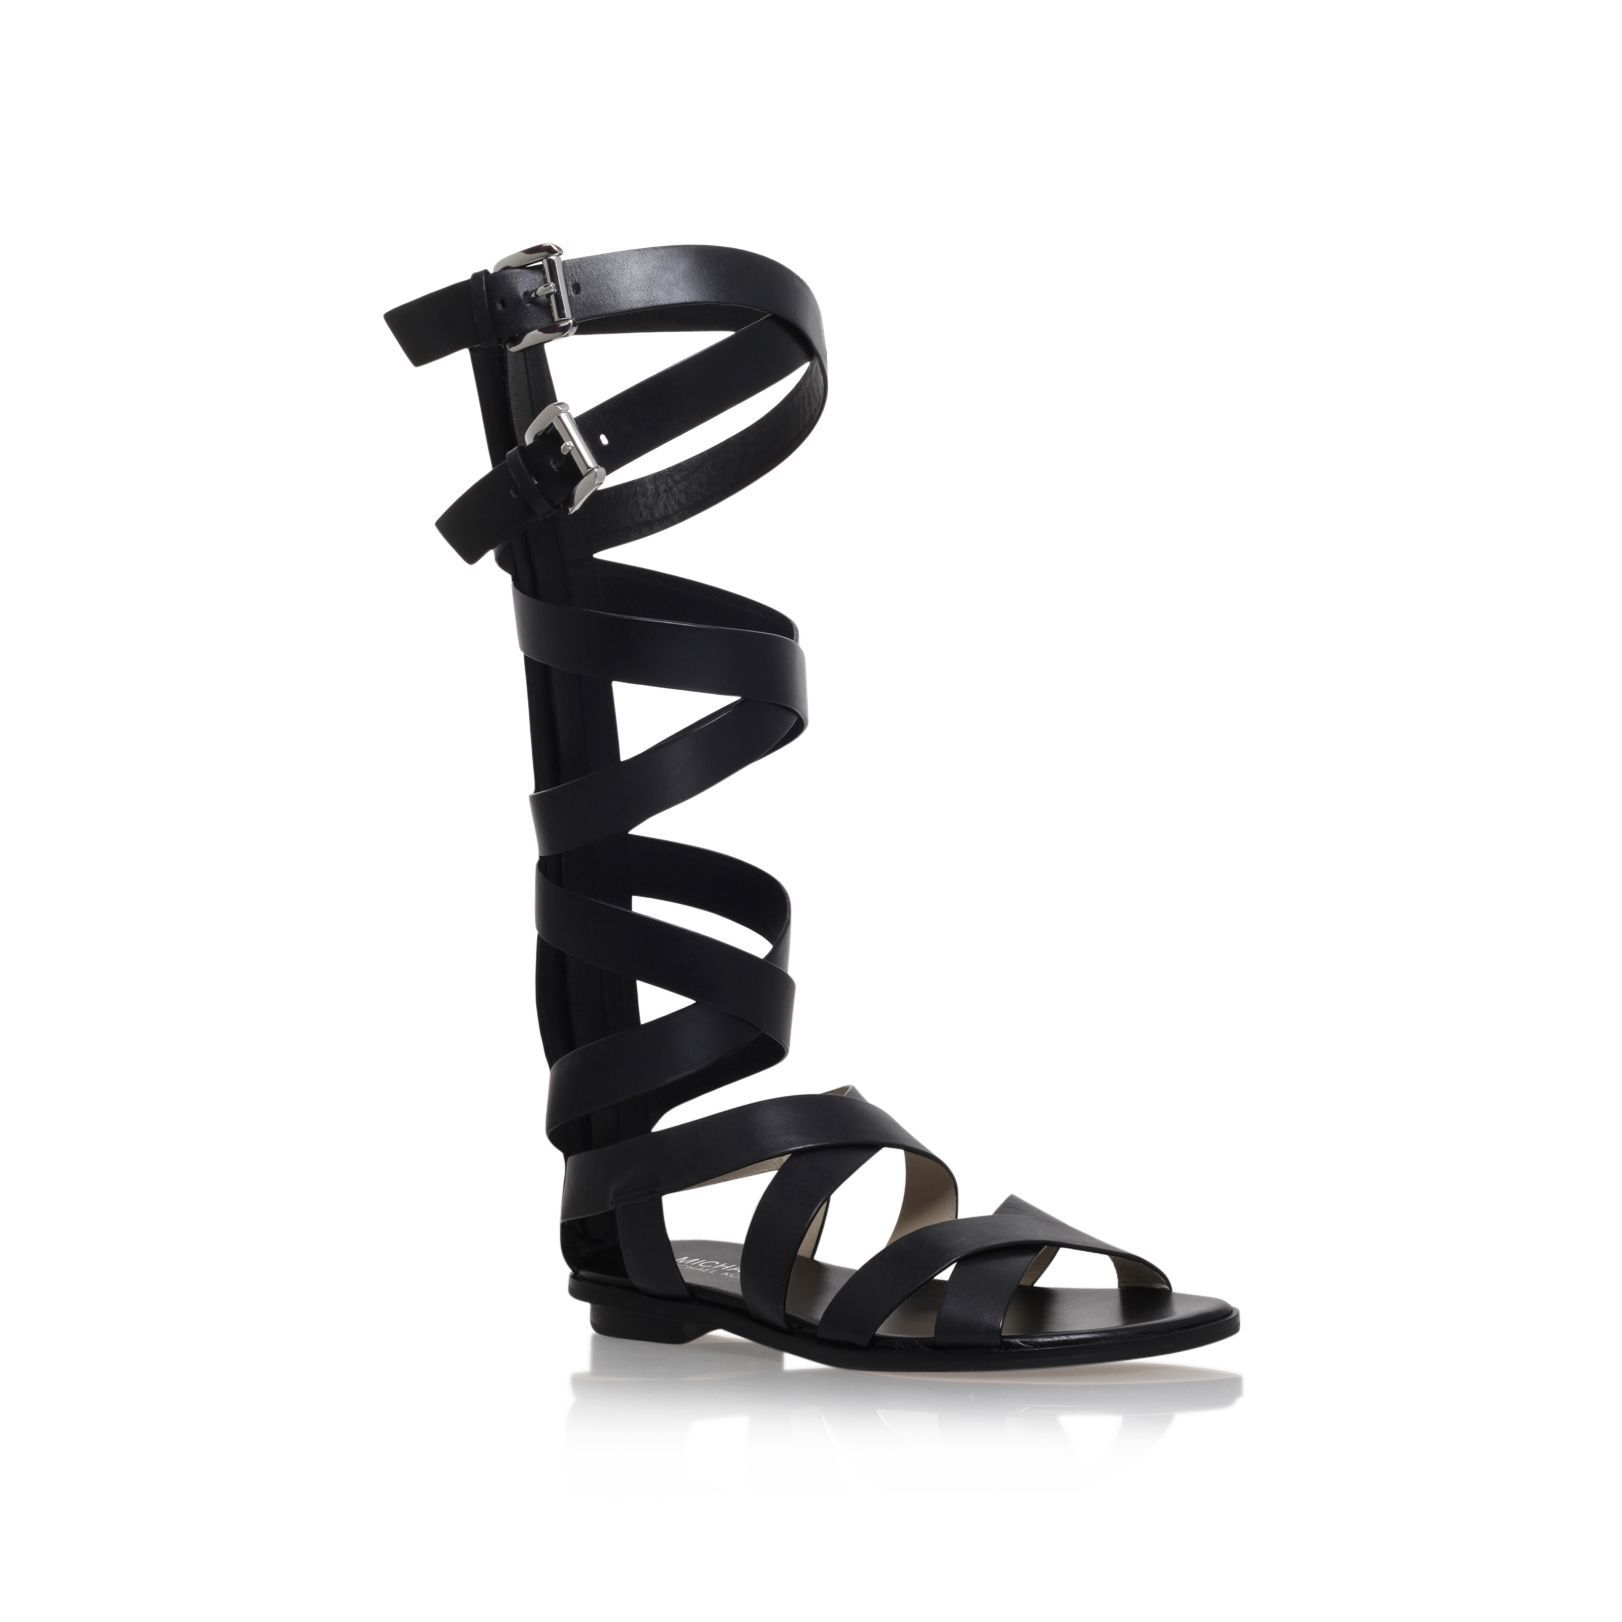 cce7b66443f Michael Kors Darby gladiator flat knee high sandals